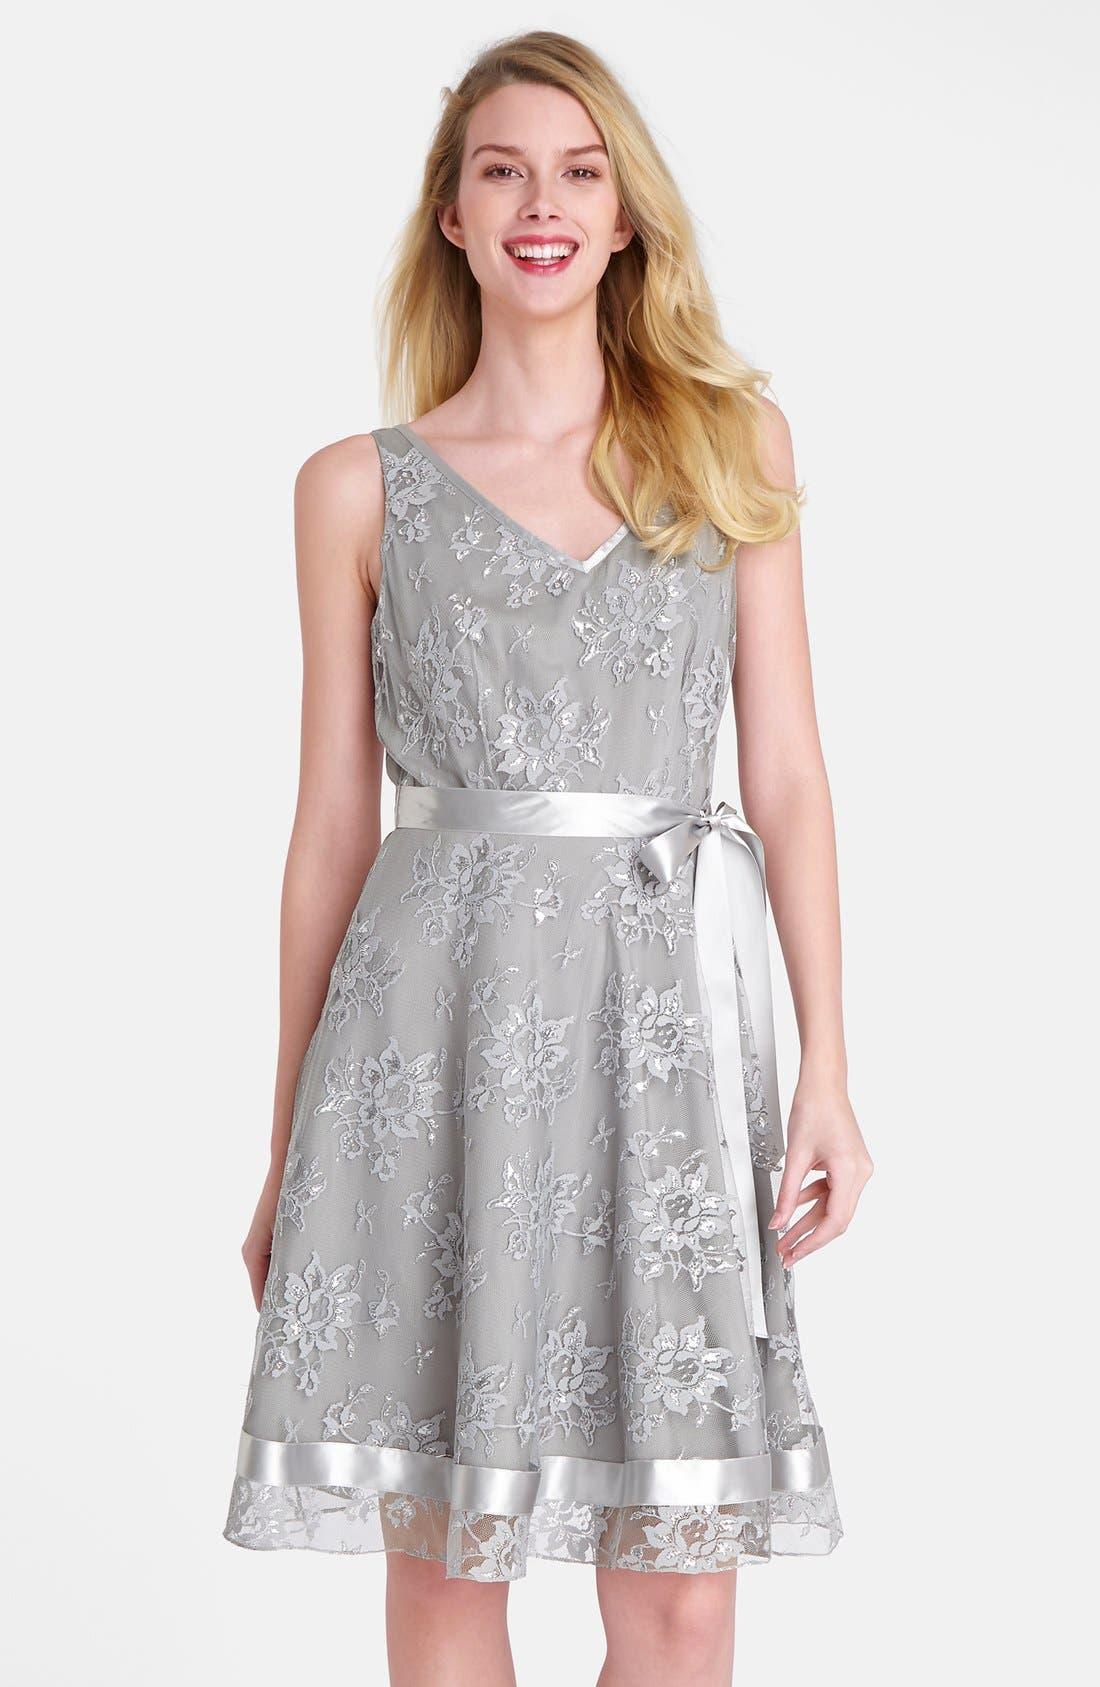 Alternate Image 1 Selected - Tahari Metallic Lace Fit & Flare Dress